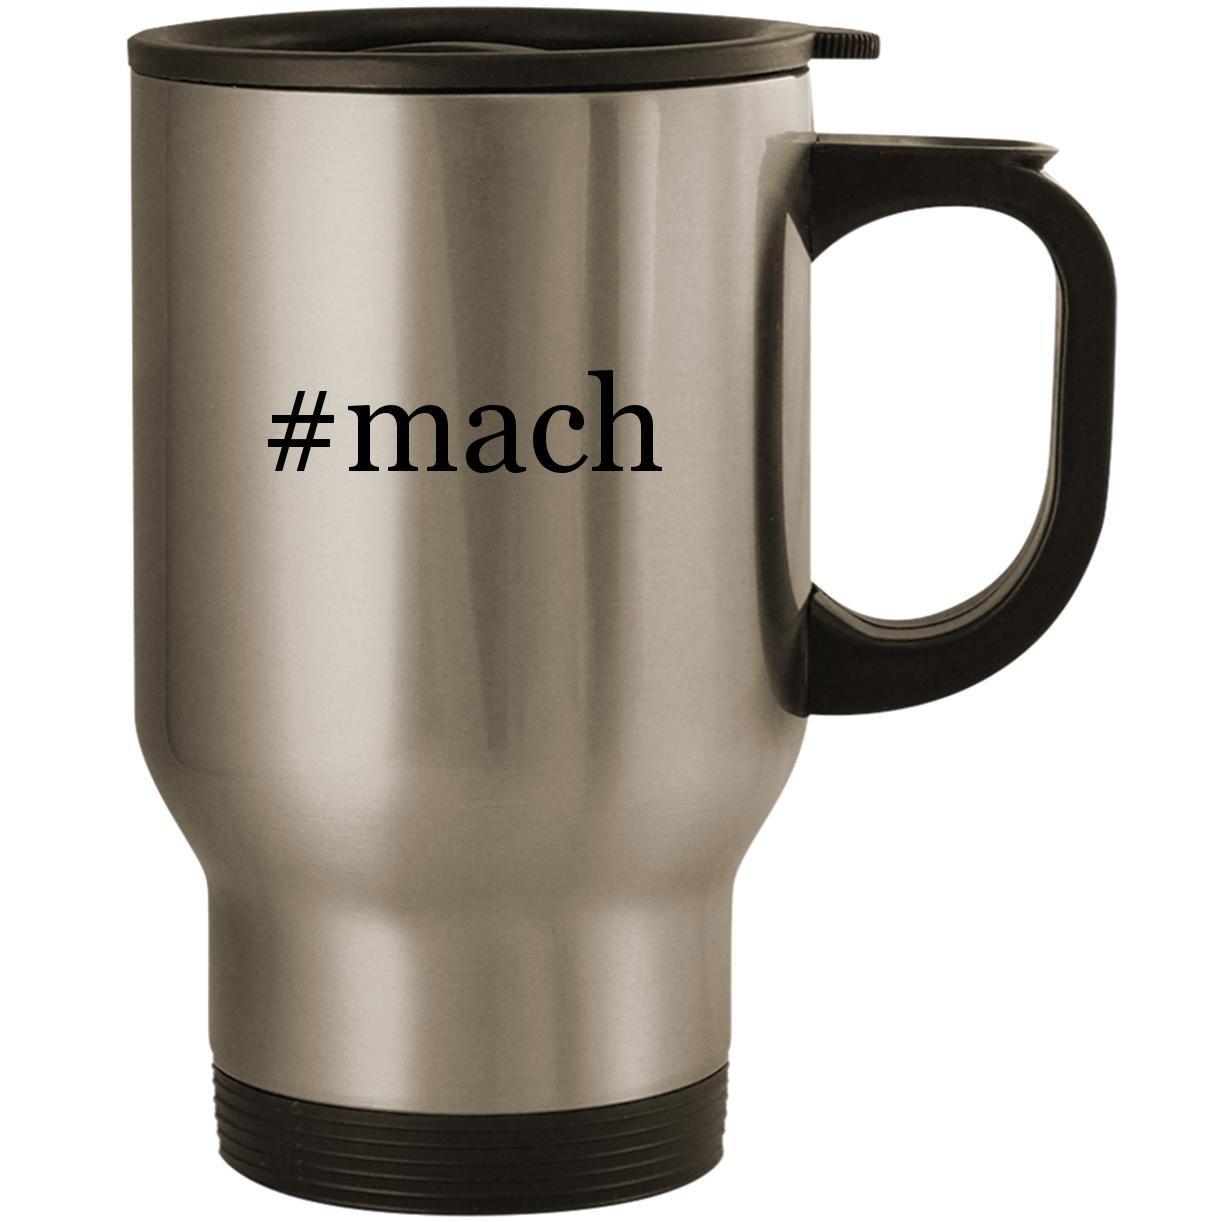 #mach - Stainless Steel 14oz Road Ready Travel Mug, Silver